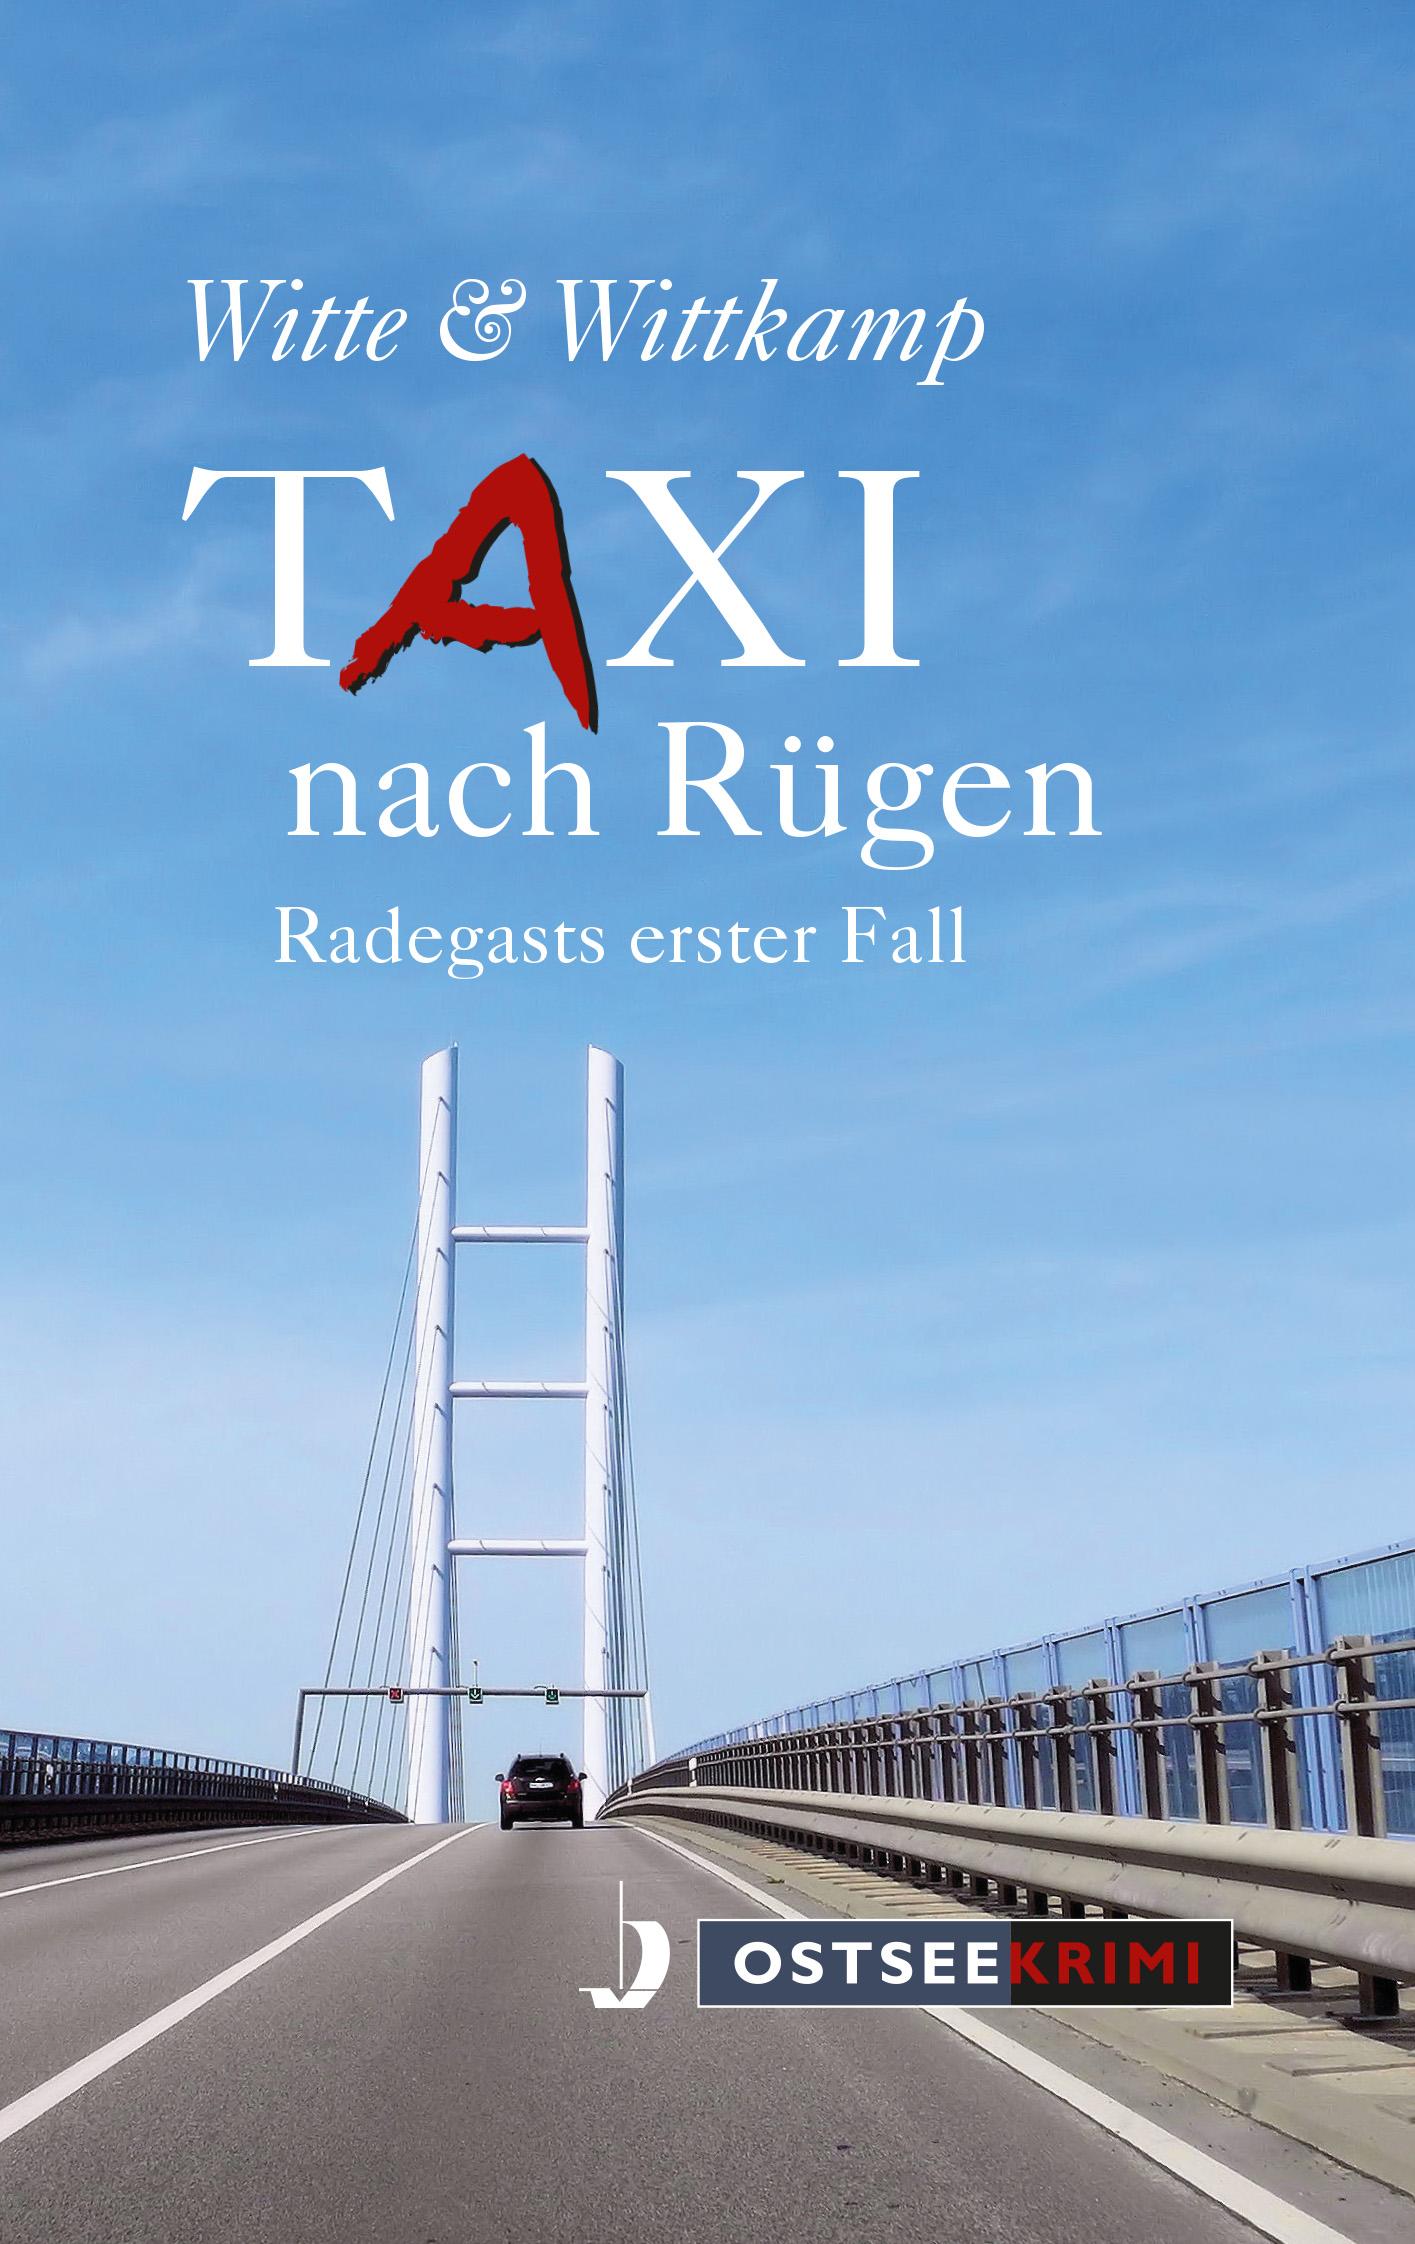 Taxi nach Rügen. Radegasts erster Fall